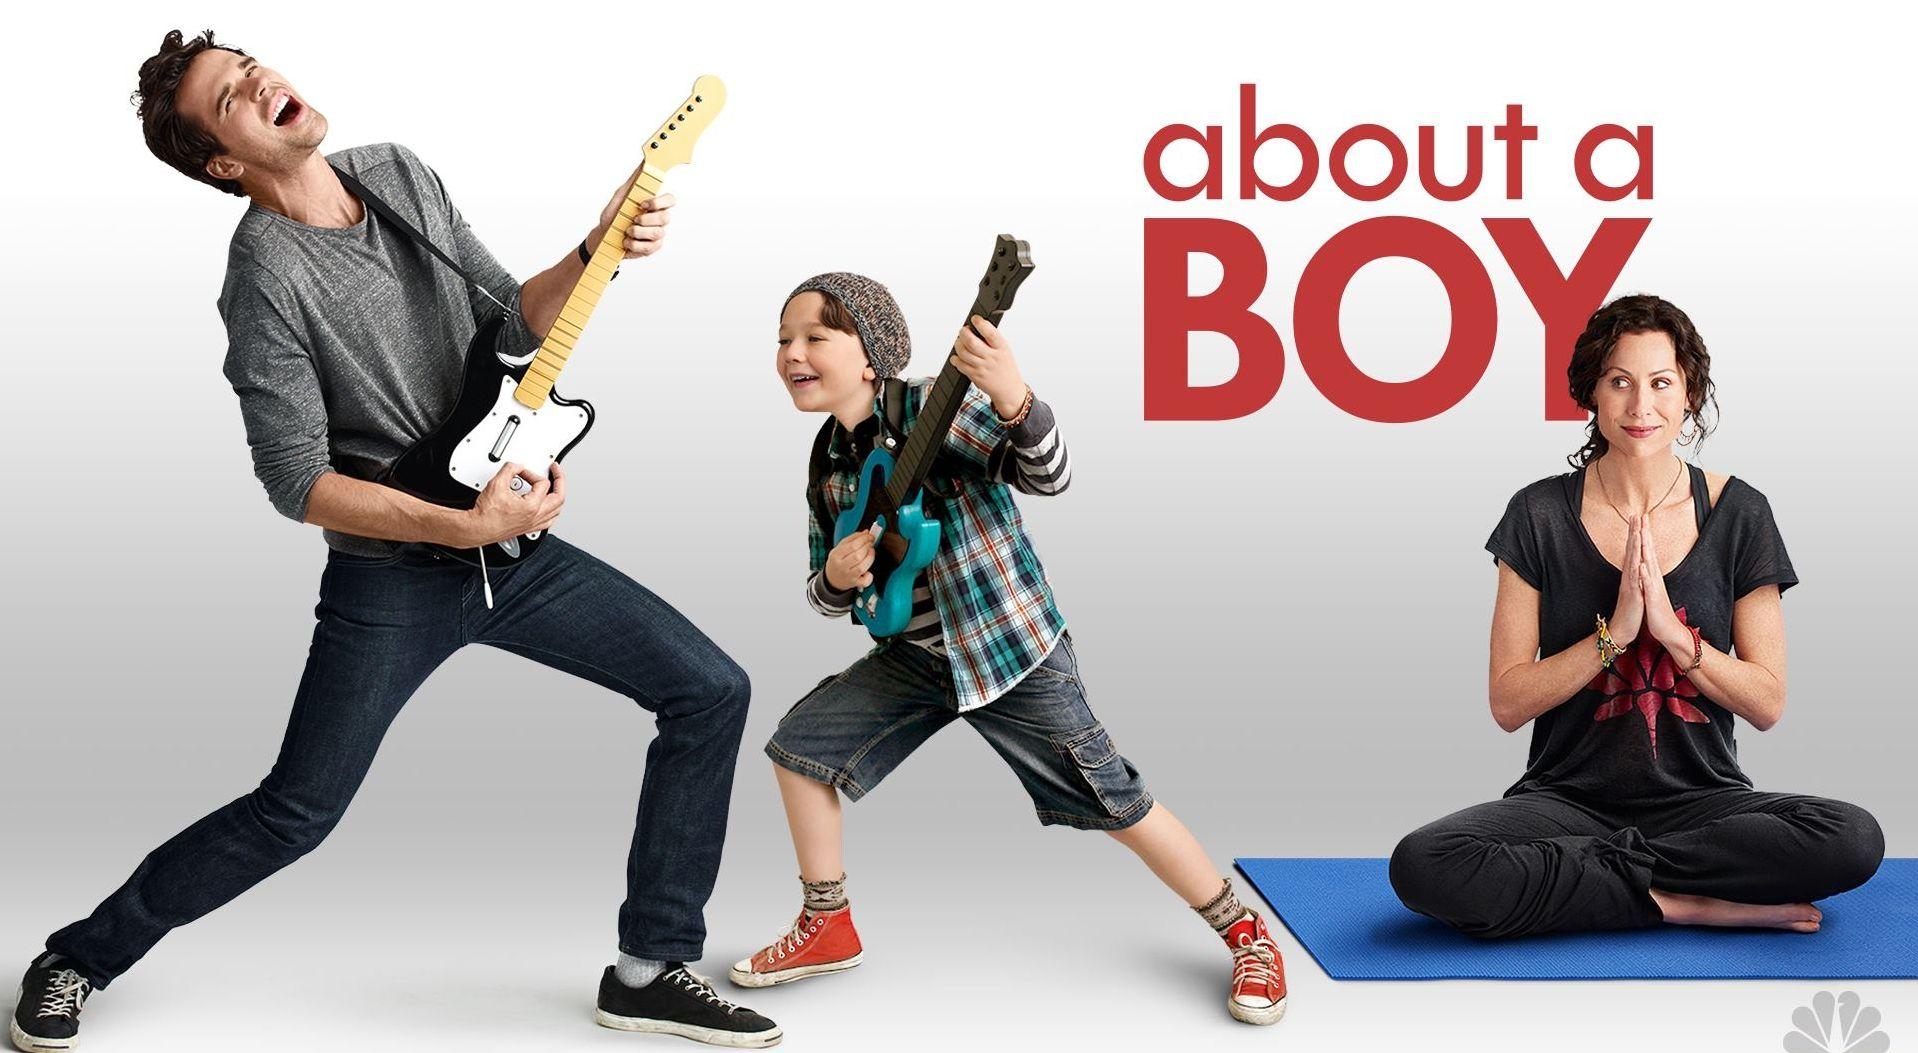 About a Boy - BookRags.com | Study Guides, Essays, Lesson ...